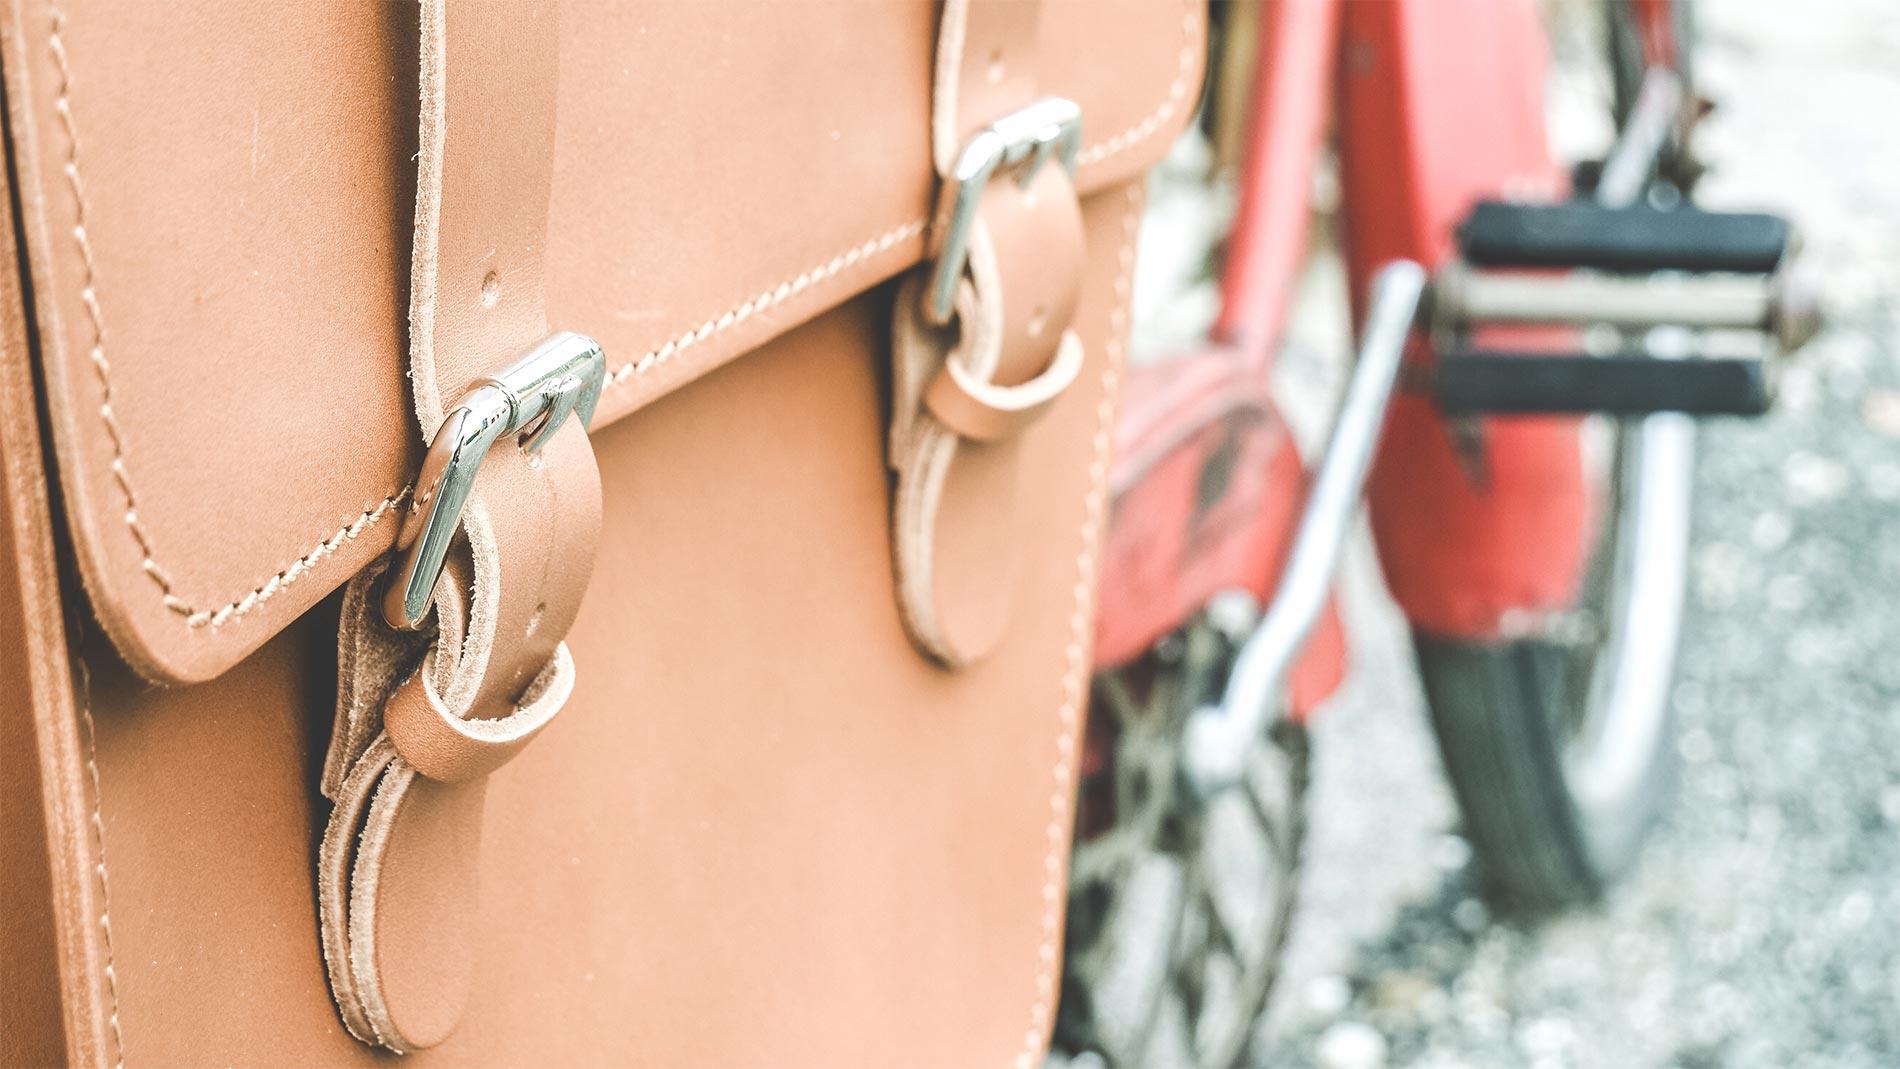 borse bici laterali in pelle vintage